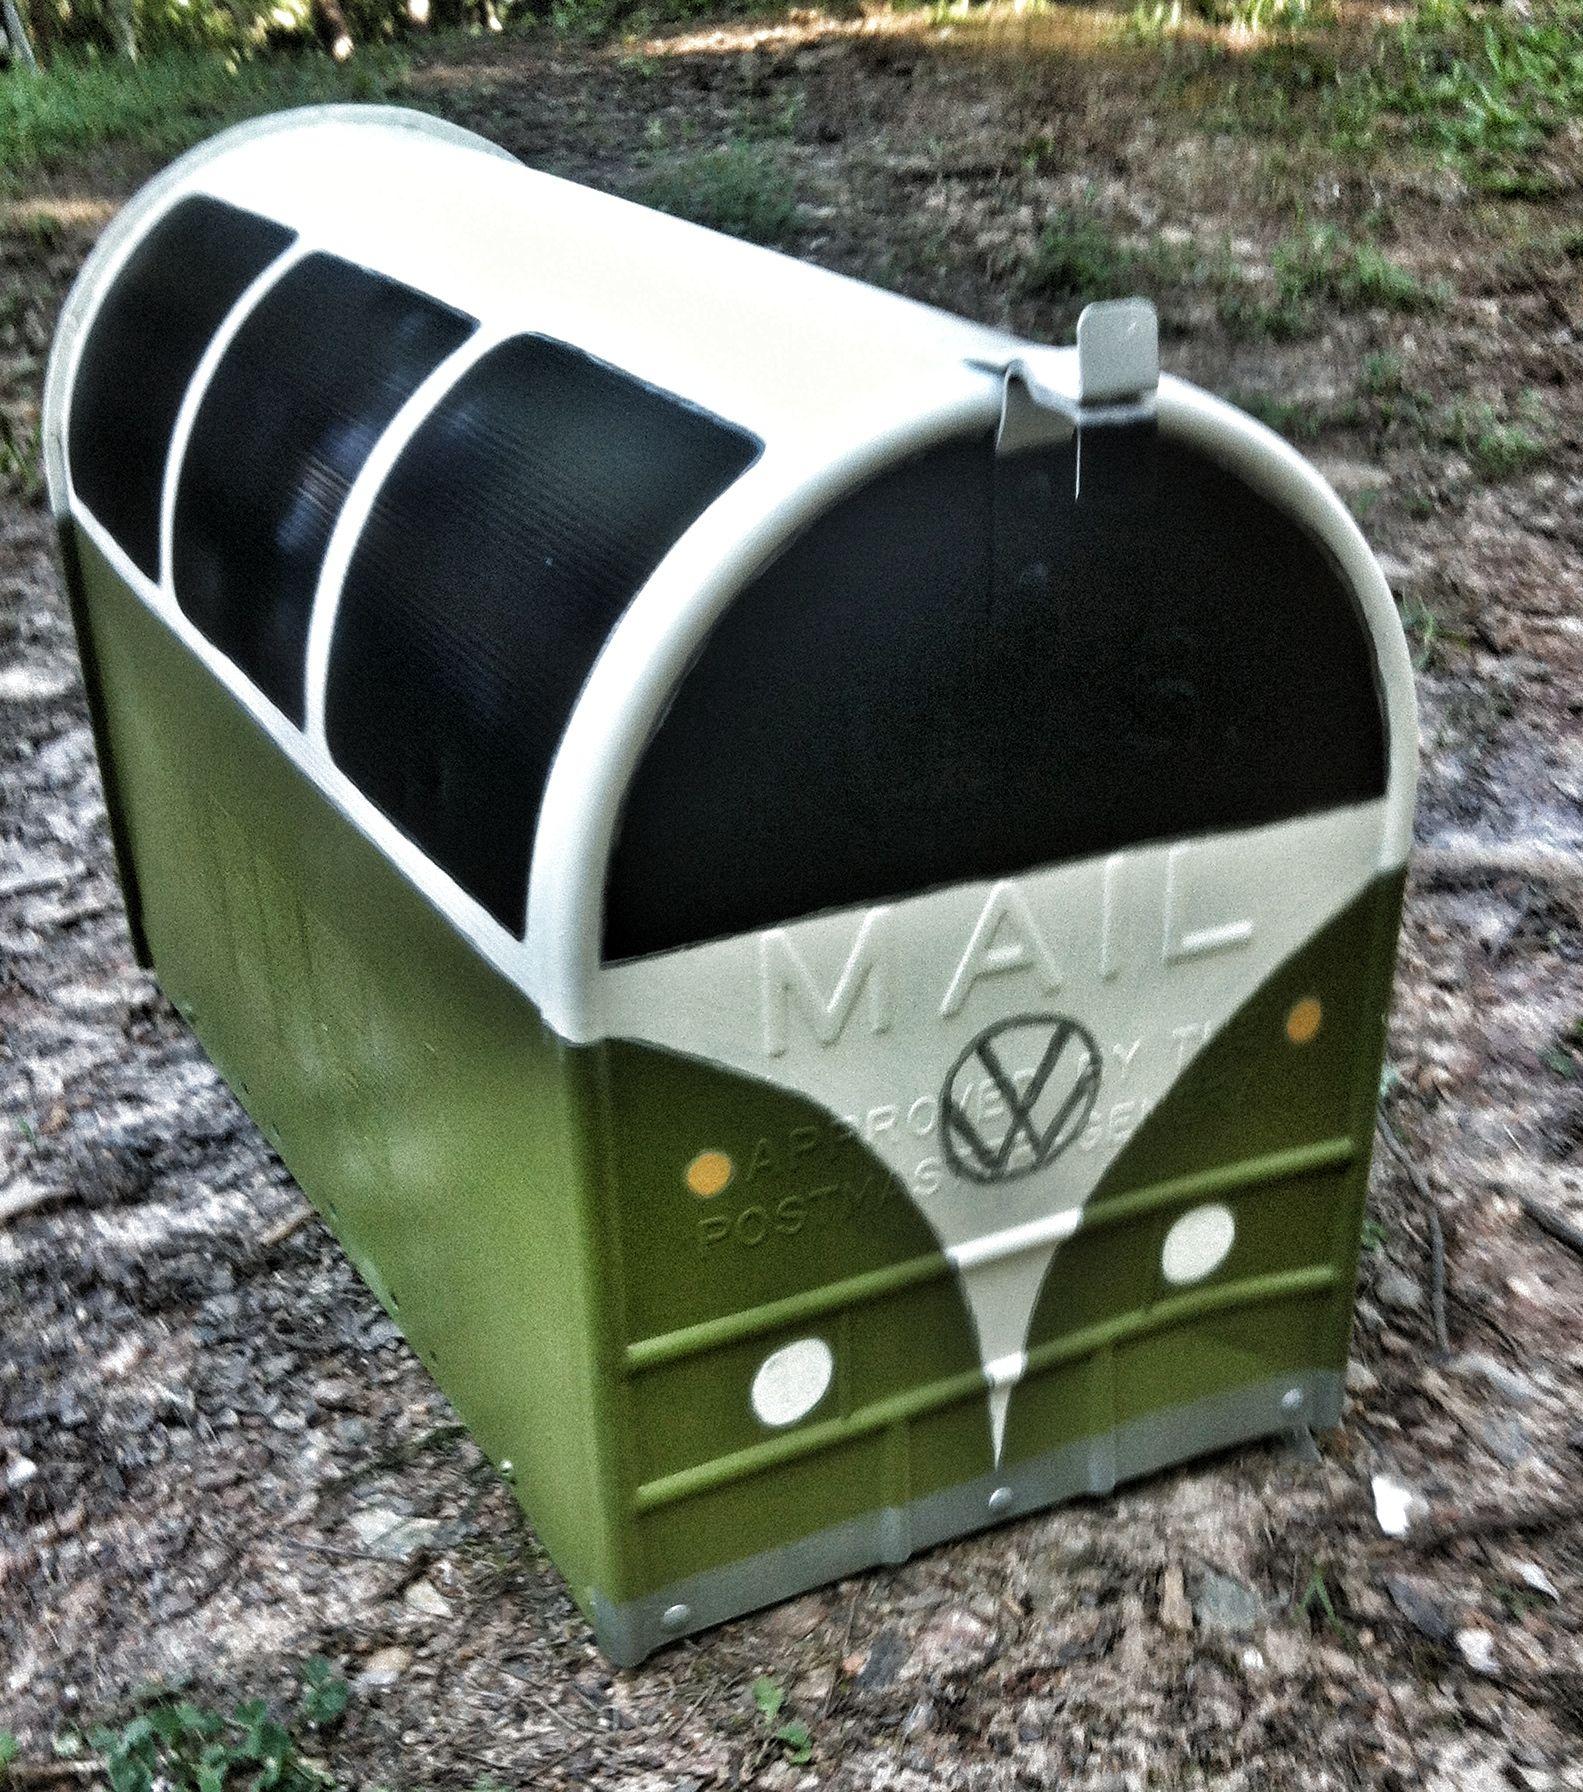 Freshly Painted Vw Bus Mailbox So Loving It Things I M Proud Of Pinterest Vw Bus Vw